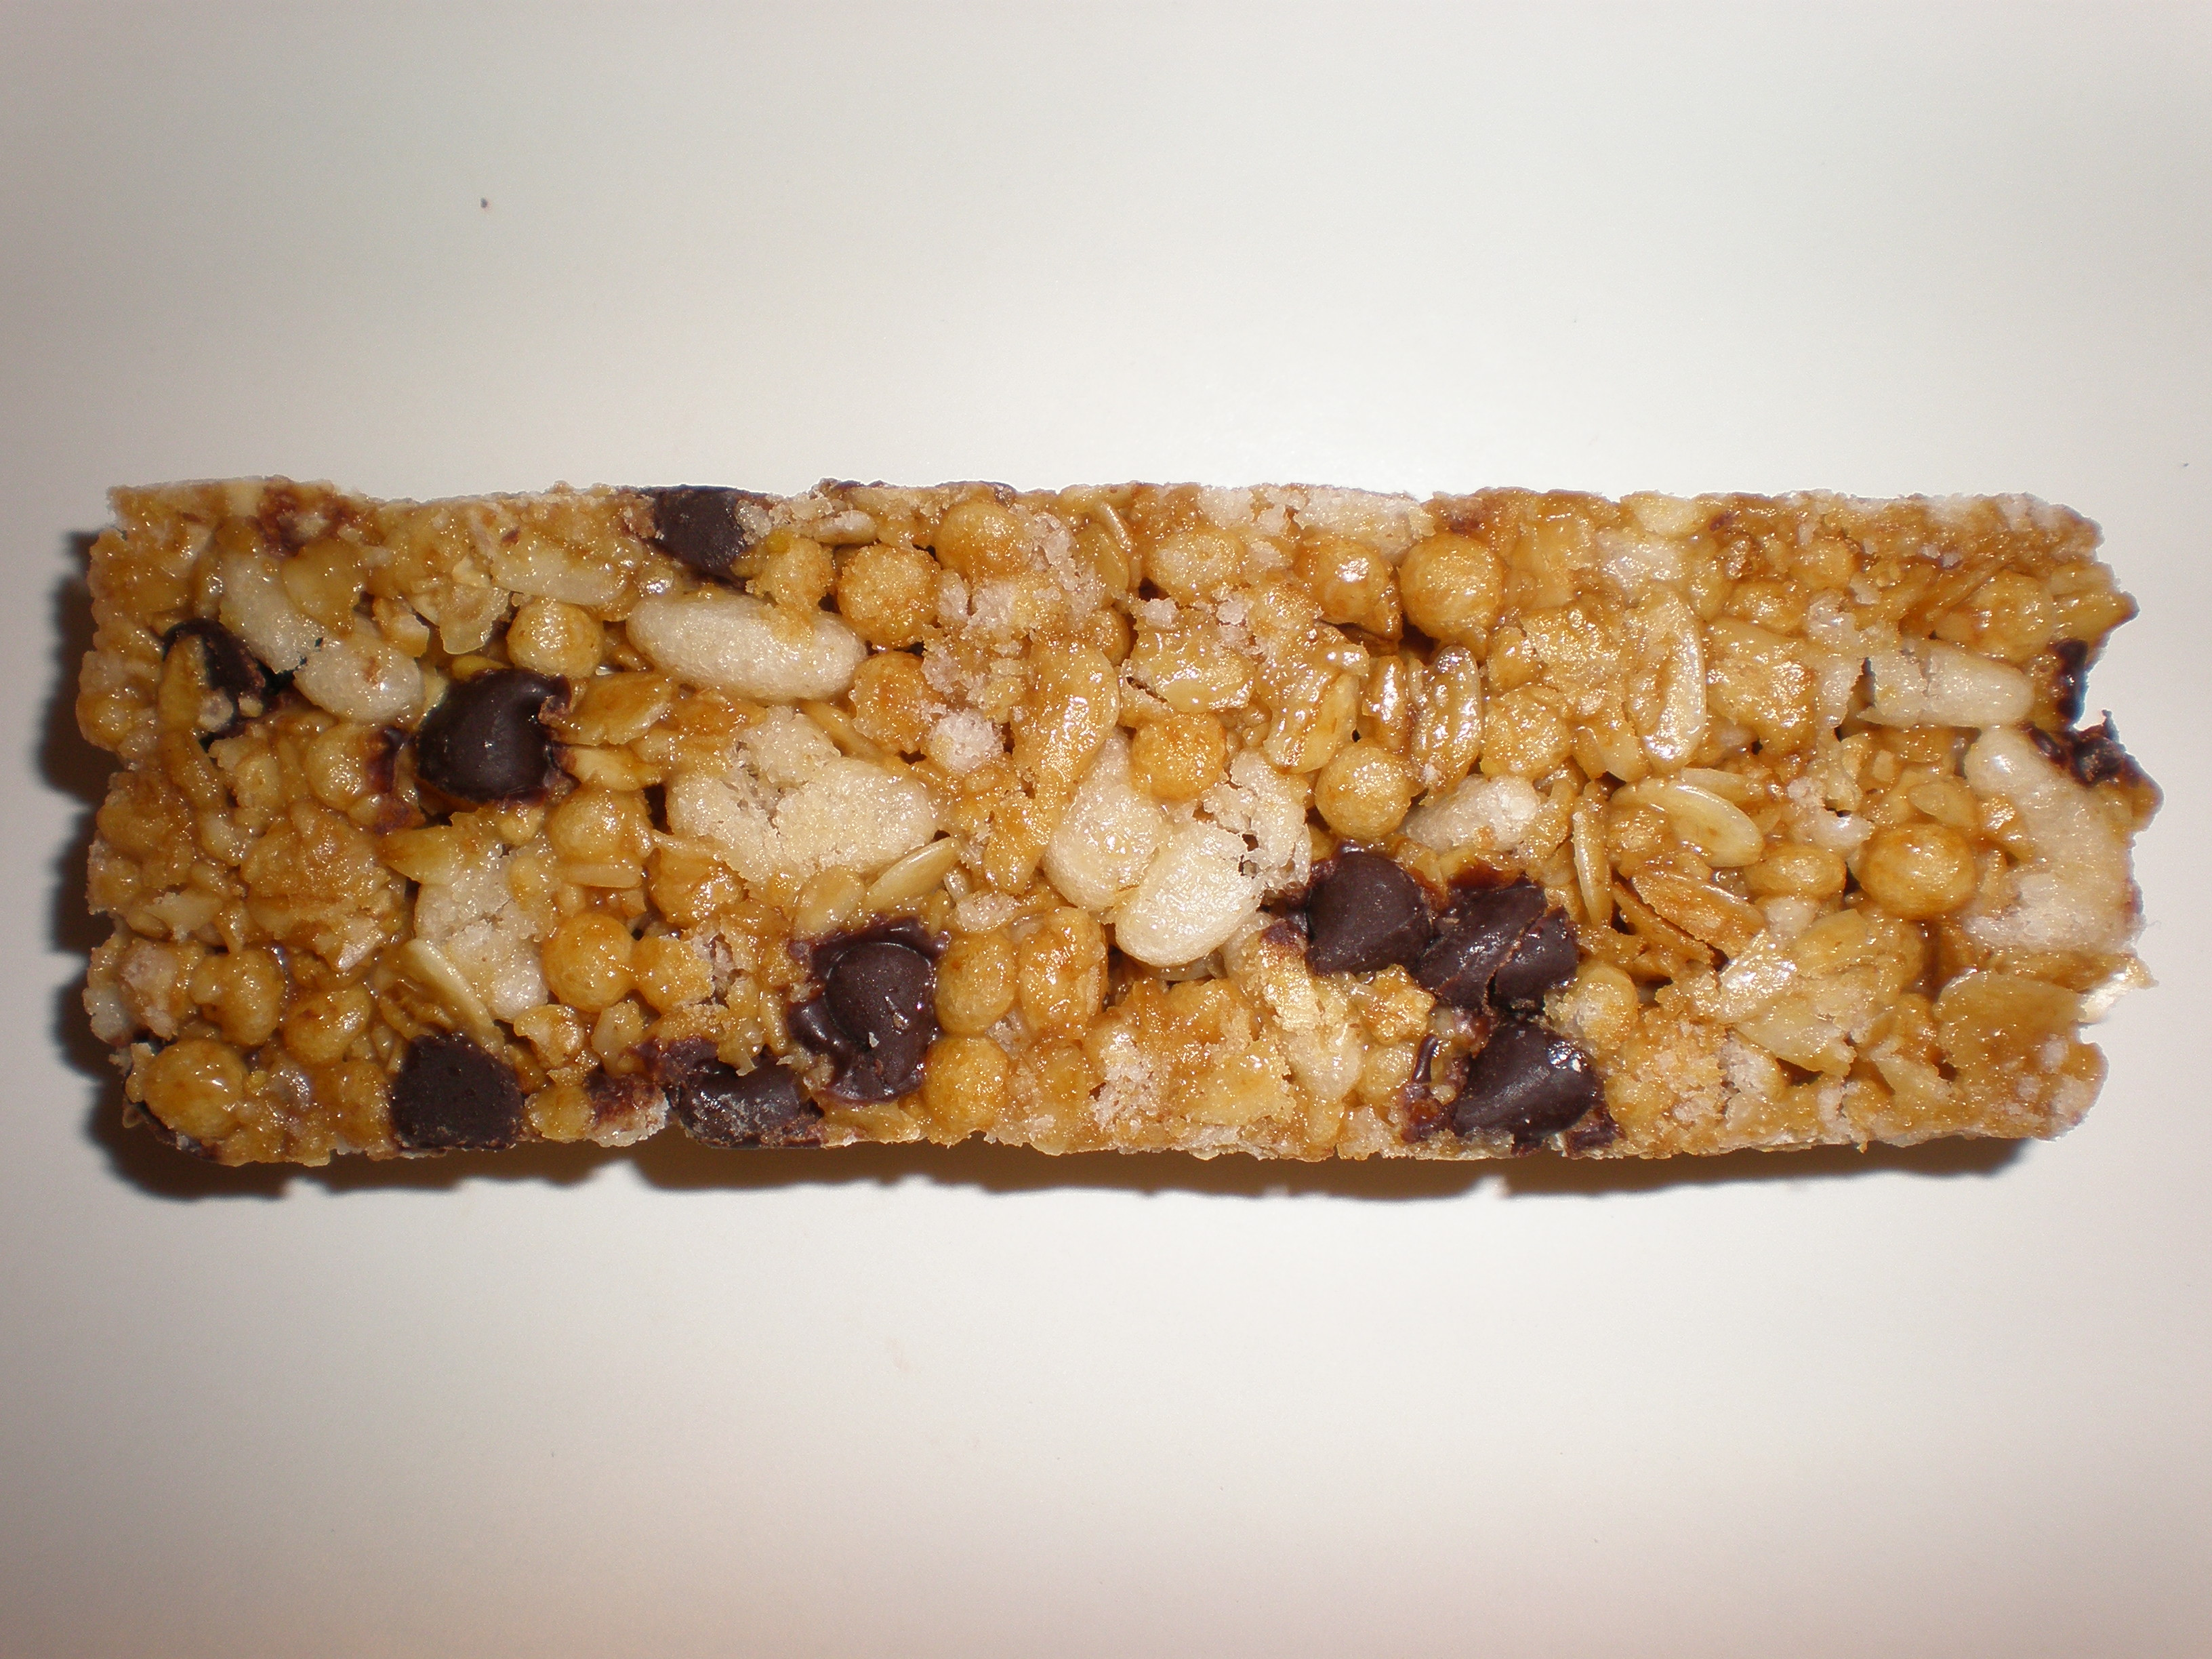 File:Quaker Chewy Granola Bar - chocolate chip.JPG - Wikimedia Commons